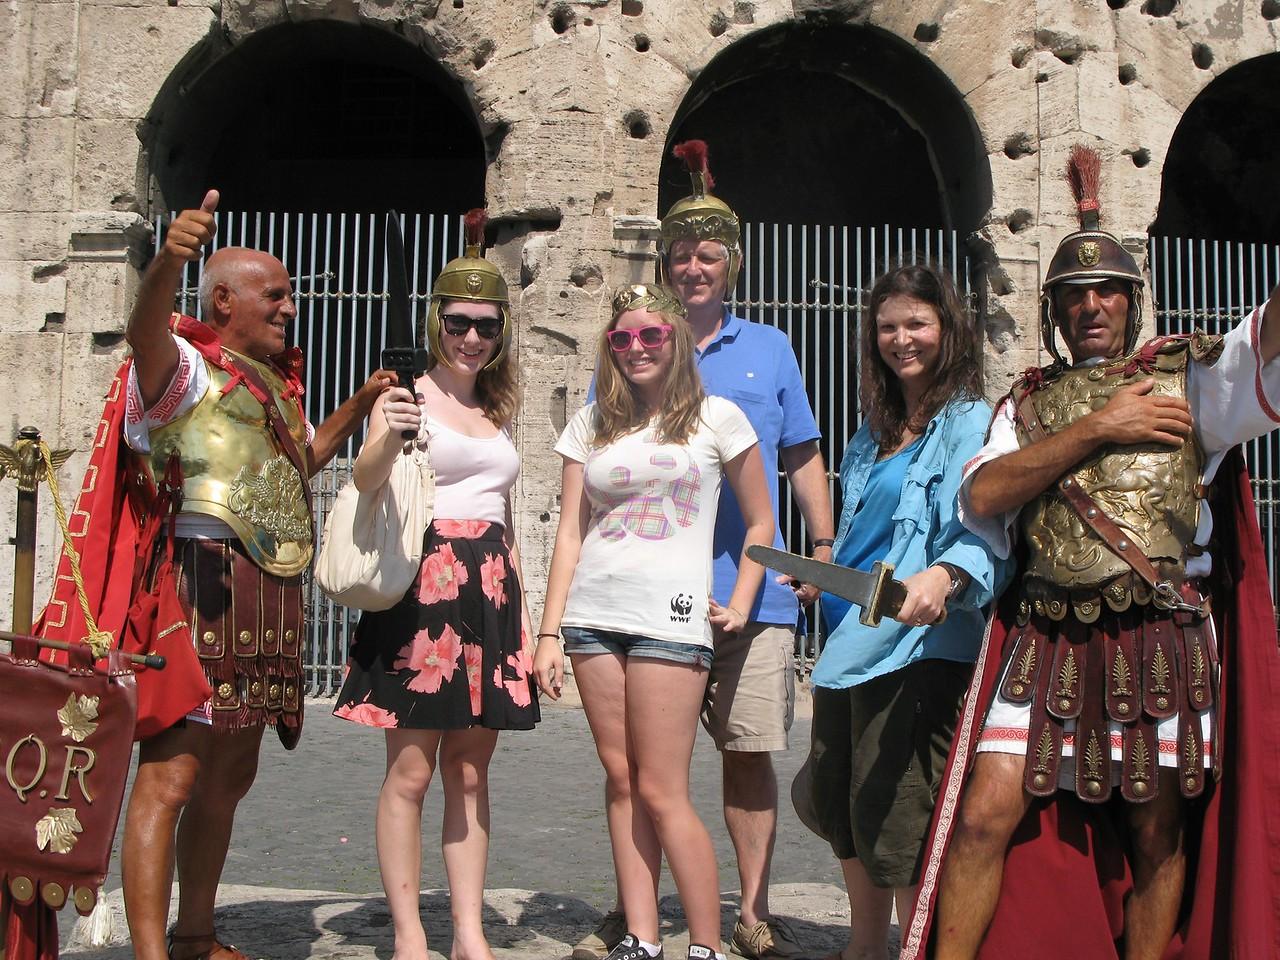 Rome, Coliseum